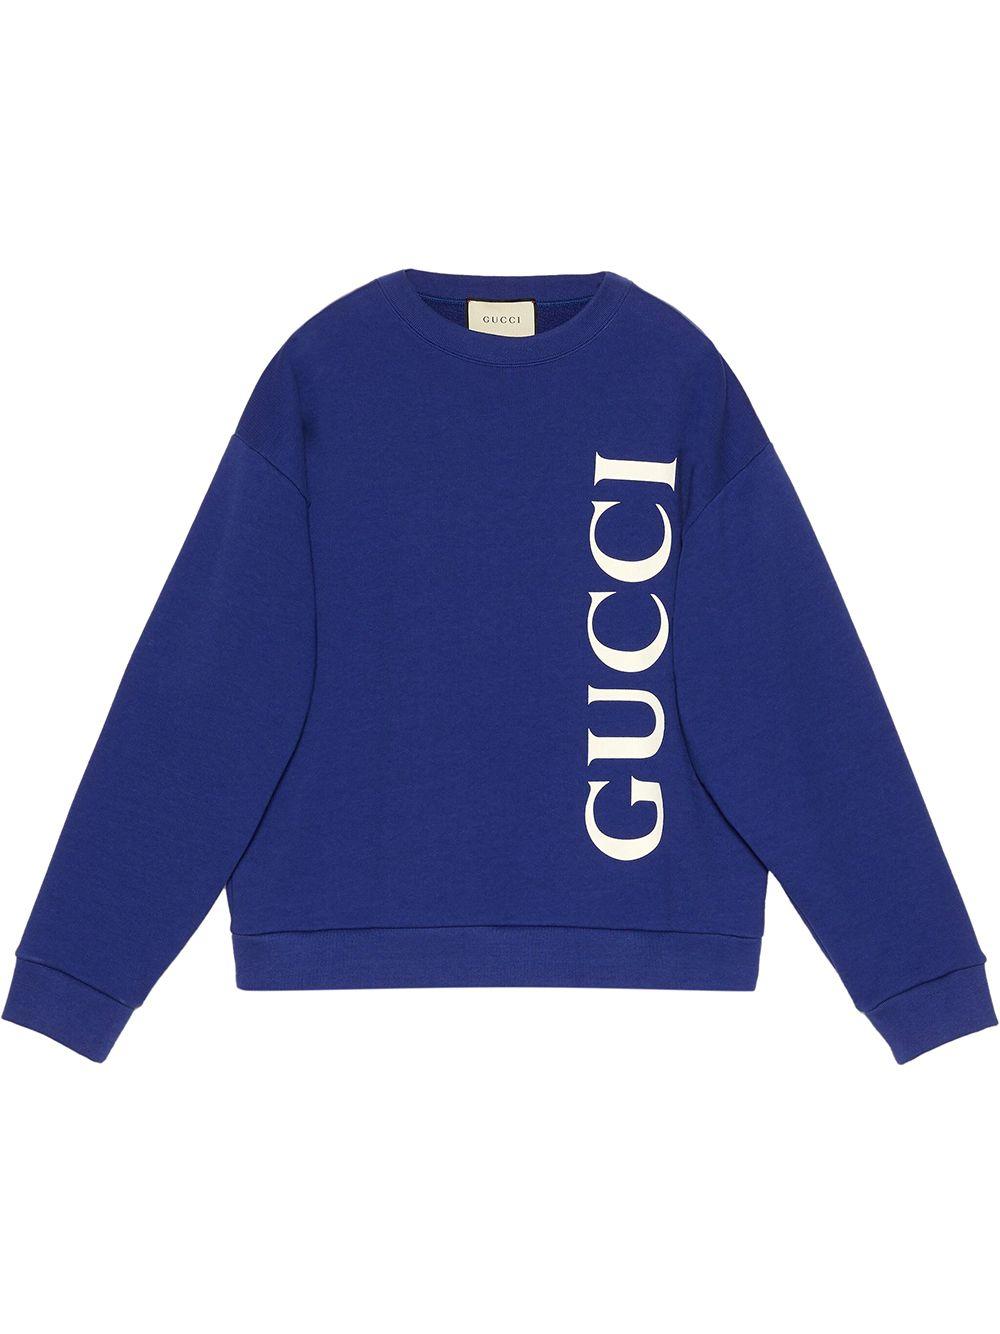 Gucci Sweatshirt mit Logo-Print - Blau